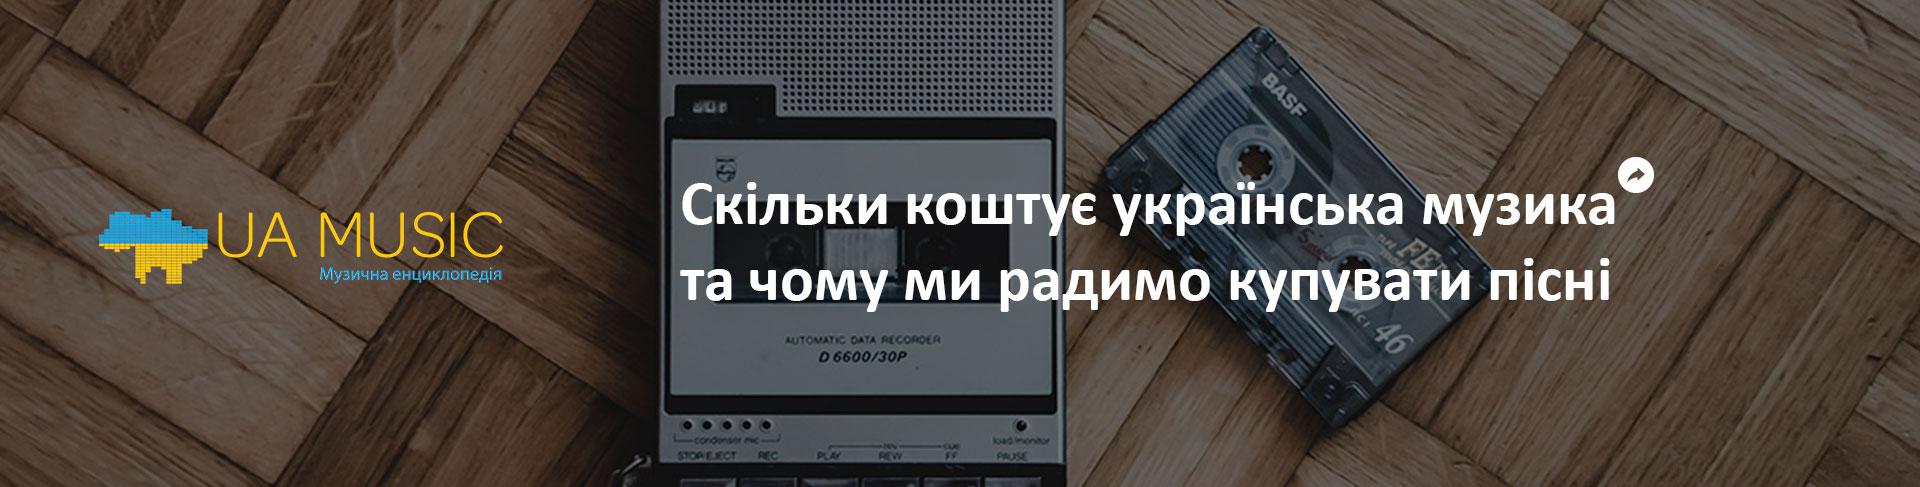 skilki_koshtue_ukr_music_19 Чаламада — UA MUSIC | Енциклопедія української музики